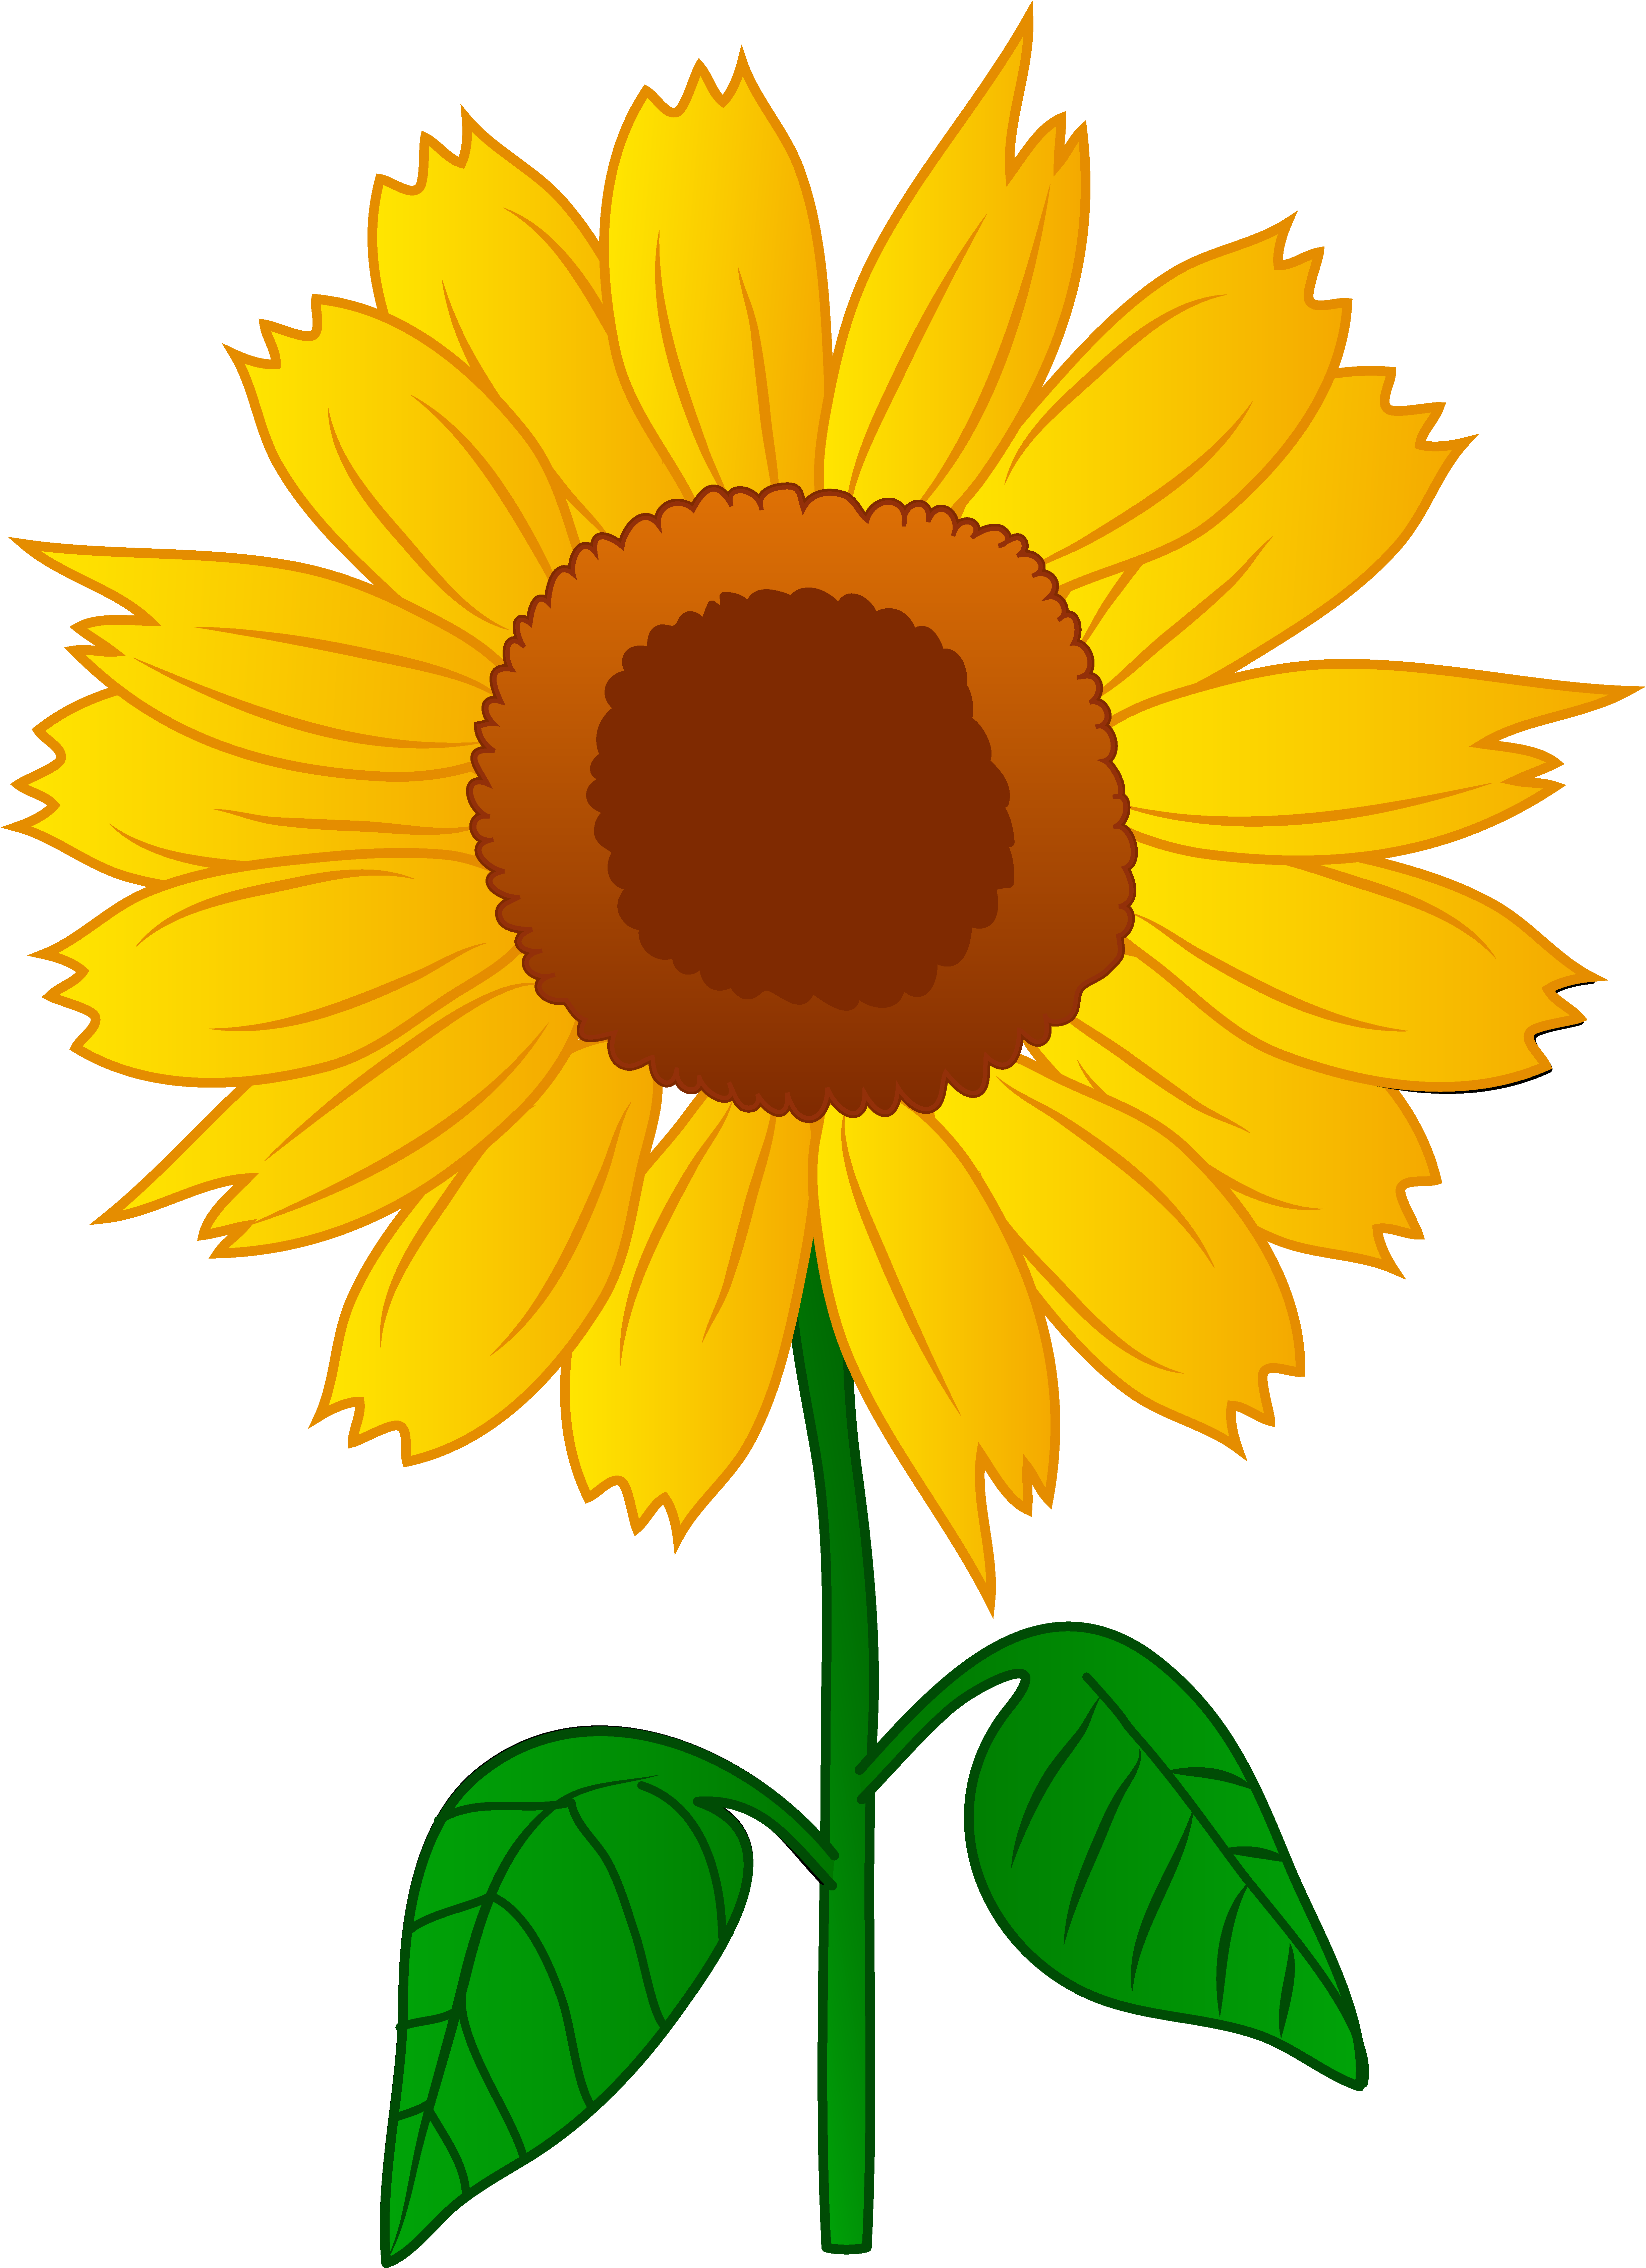 Sunflower sun clipart vector black and white stock Sun Border Clipart | Free download best Sun Border Clipart on ... vector black and white stock